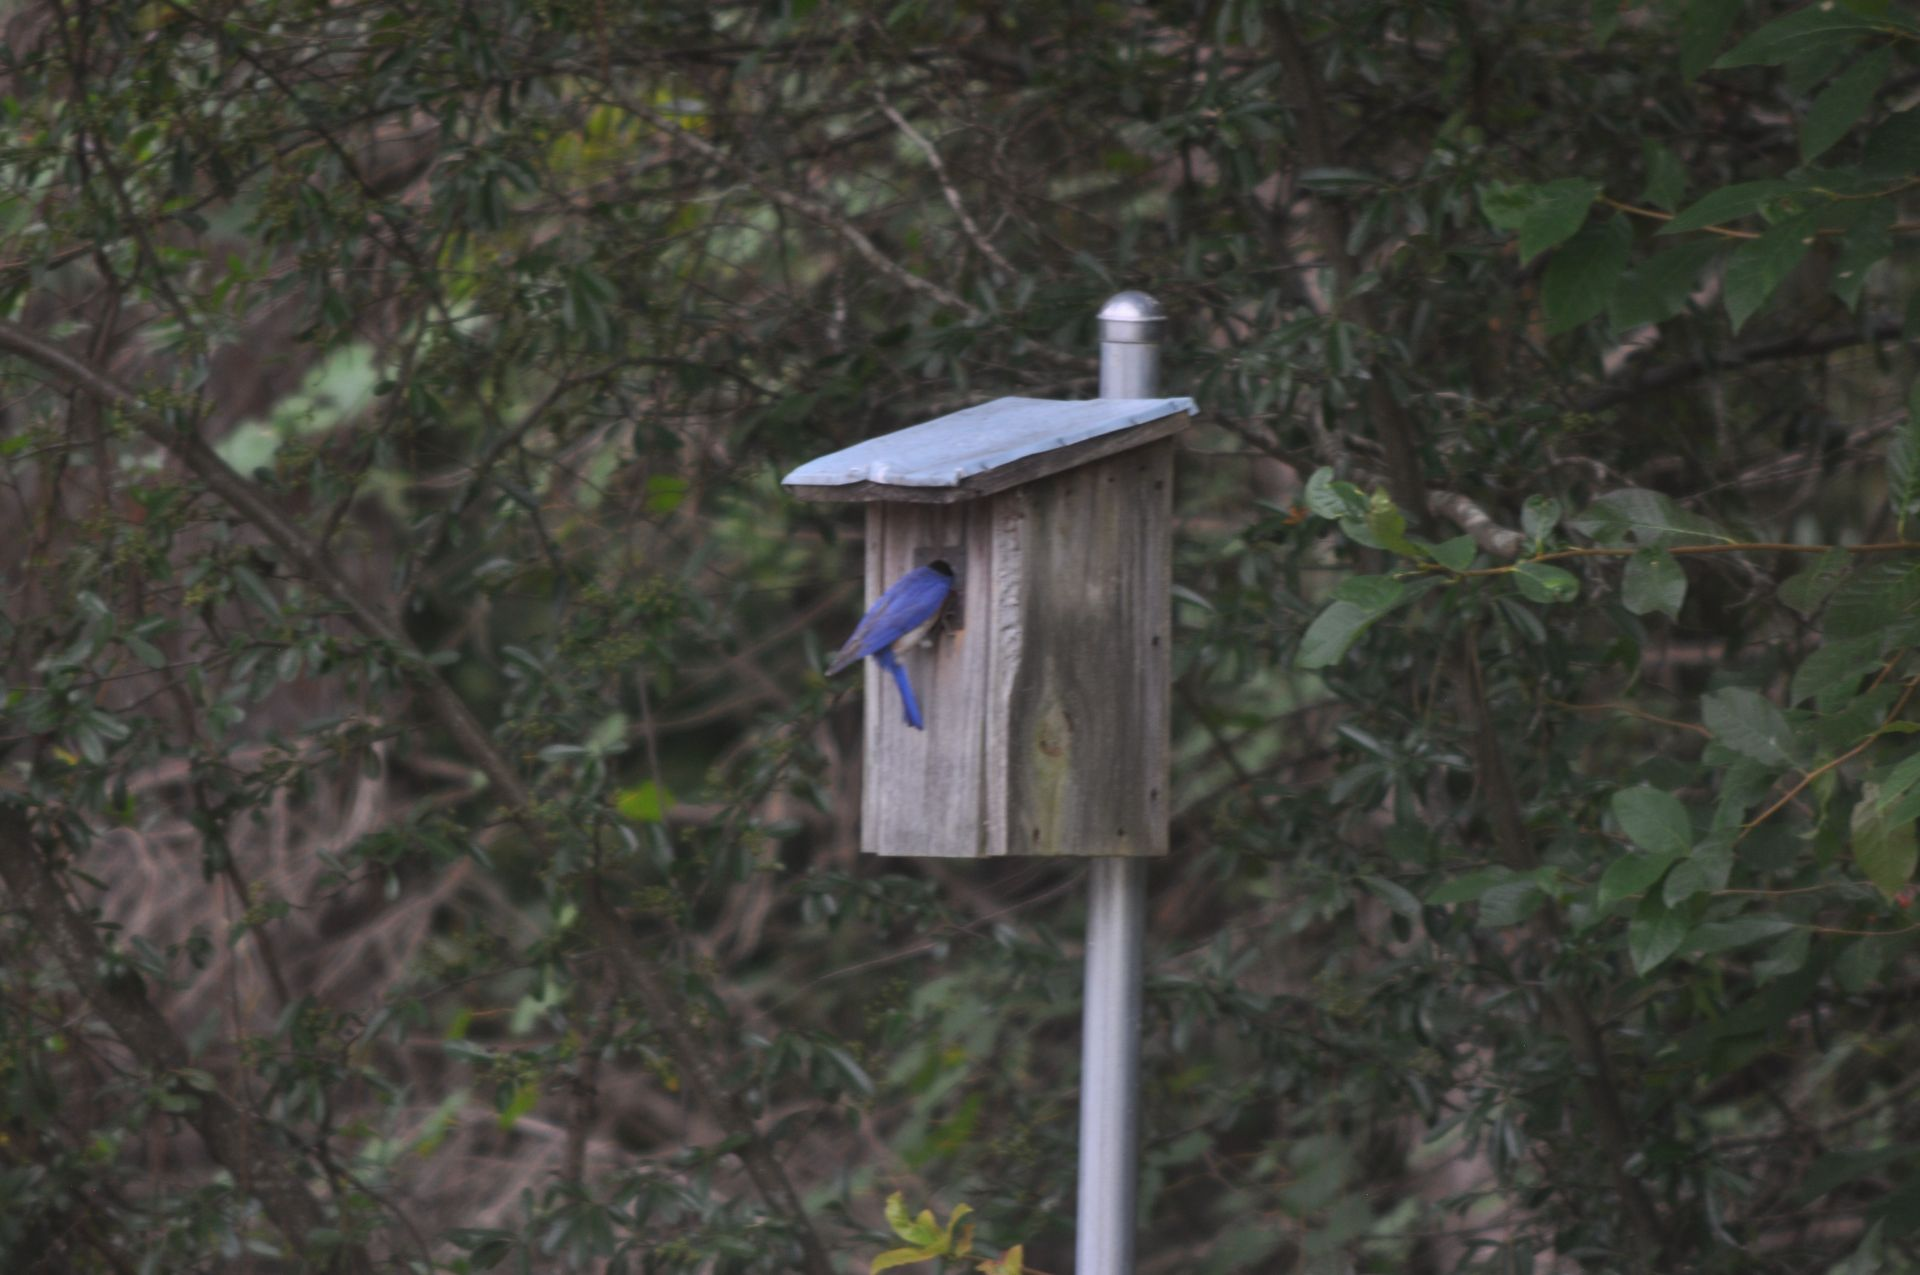 Blue Bird feeding.jpg